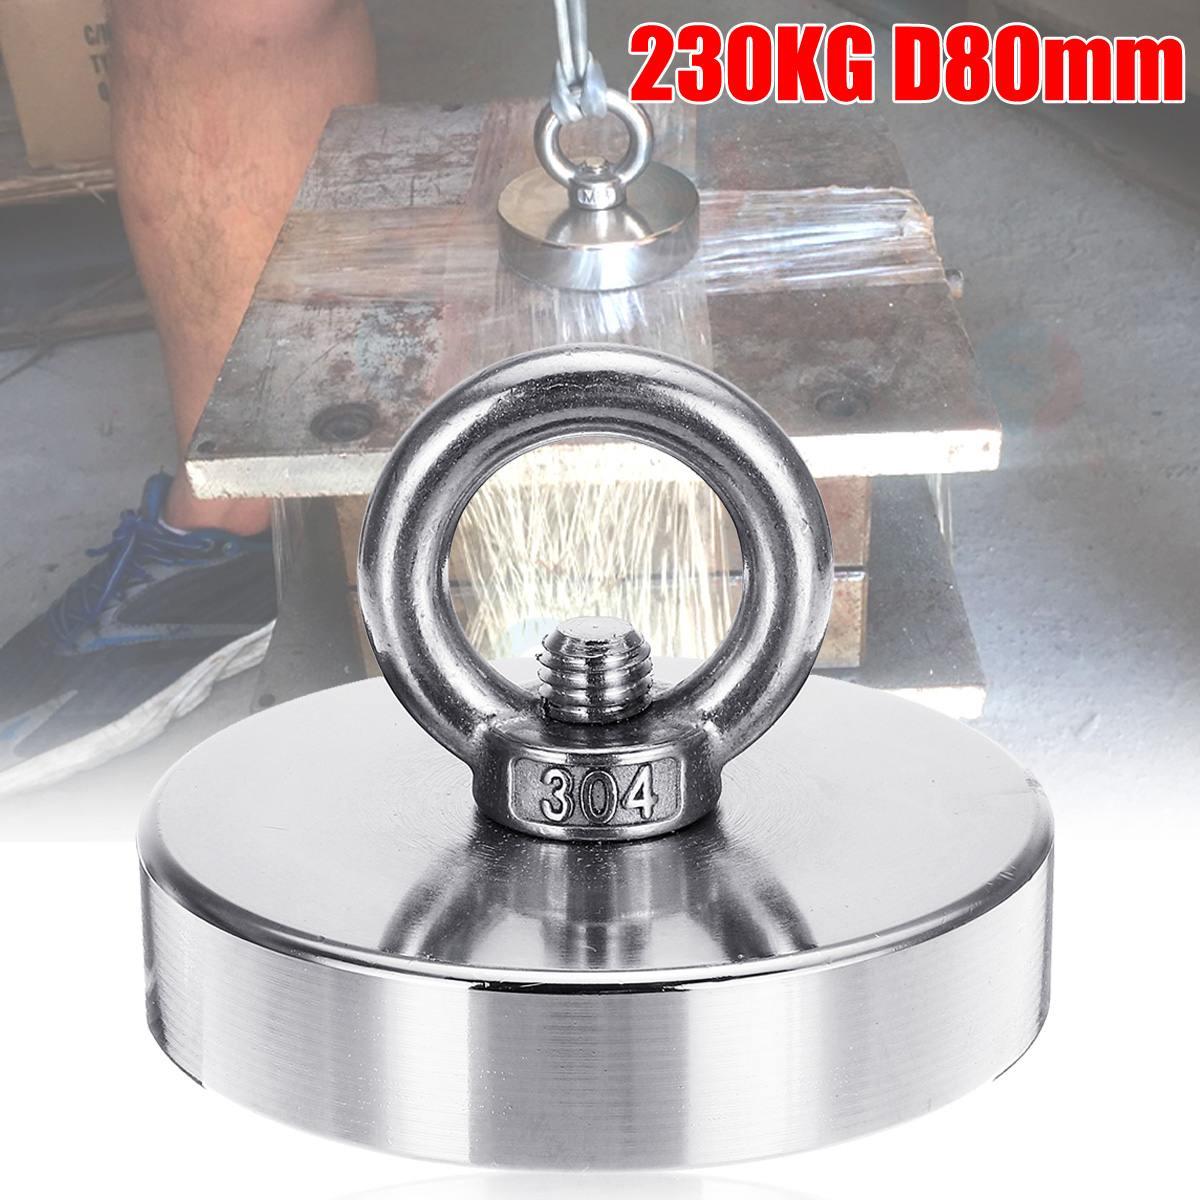 SWILET 230KG D80mm Neodymium Magnet Recovery Imanes Metal Detector Salvage Magnet Pot Treasure Hunting Underwater Fishing Aimant